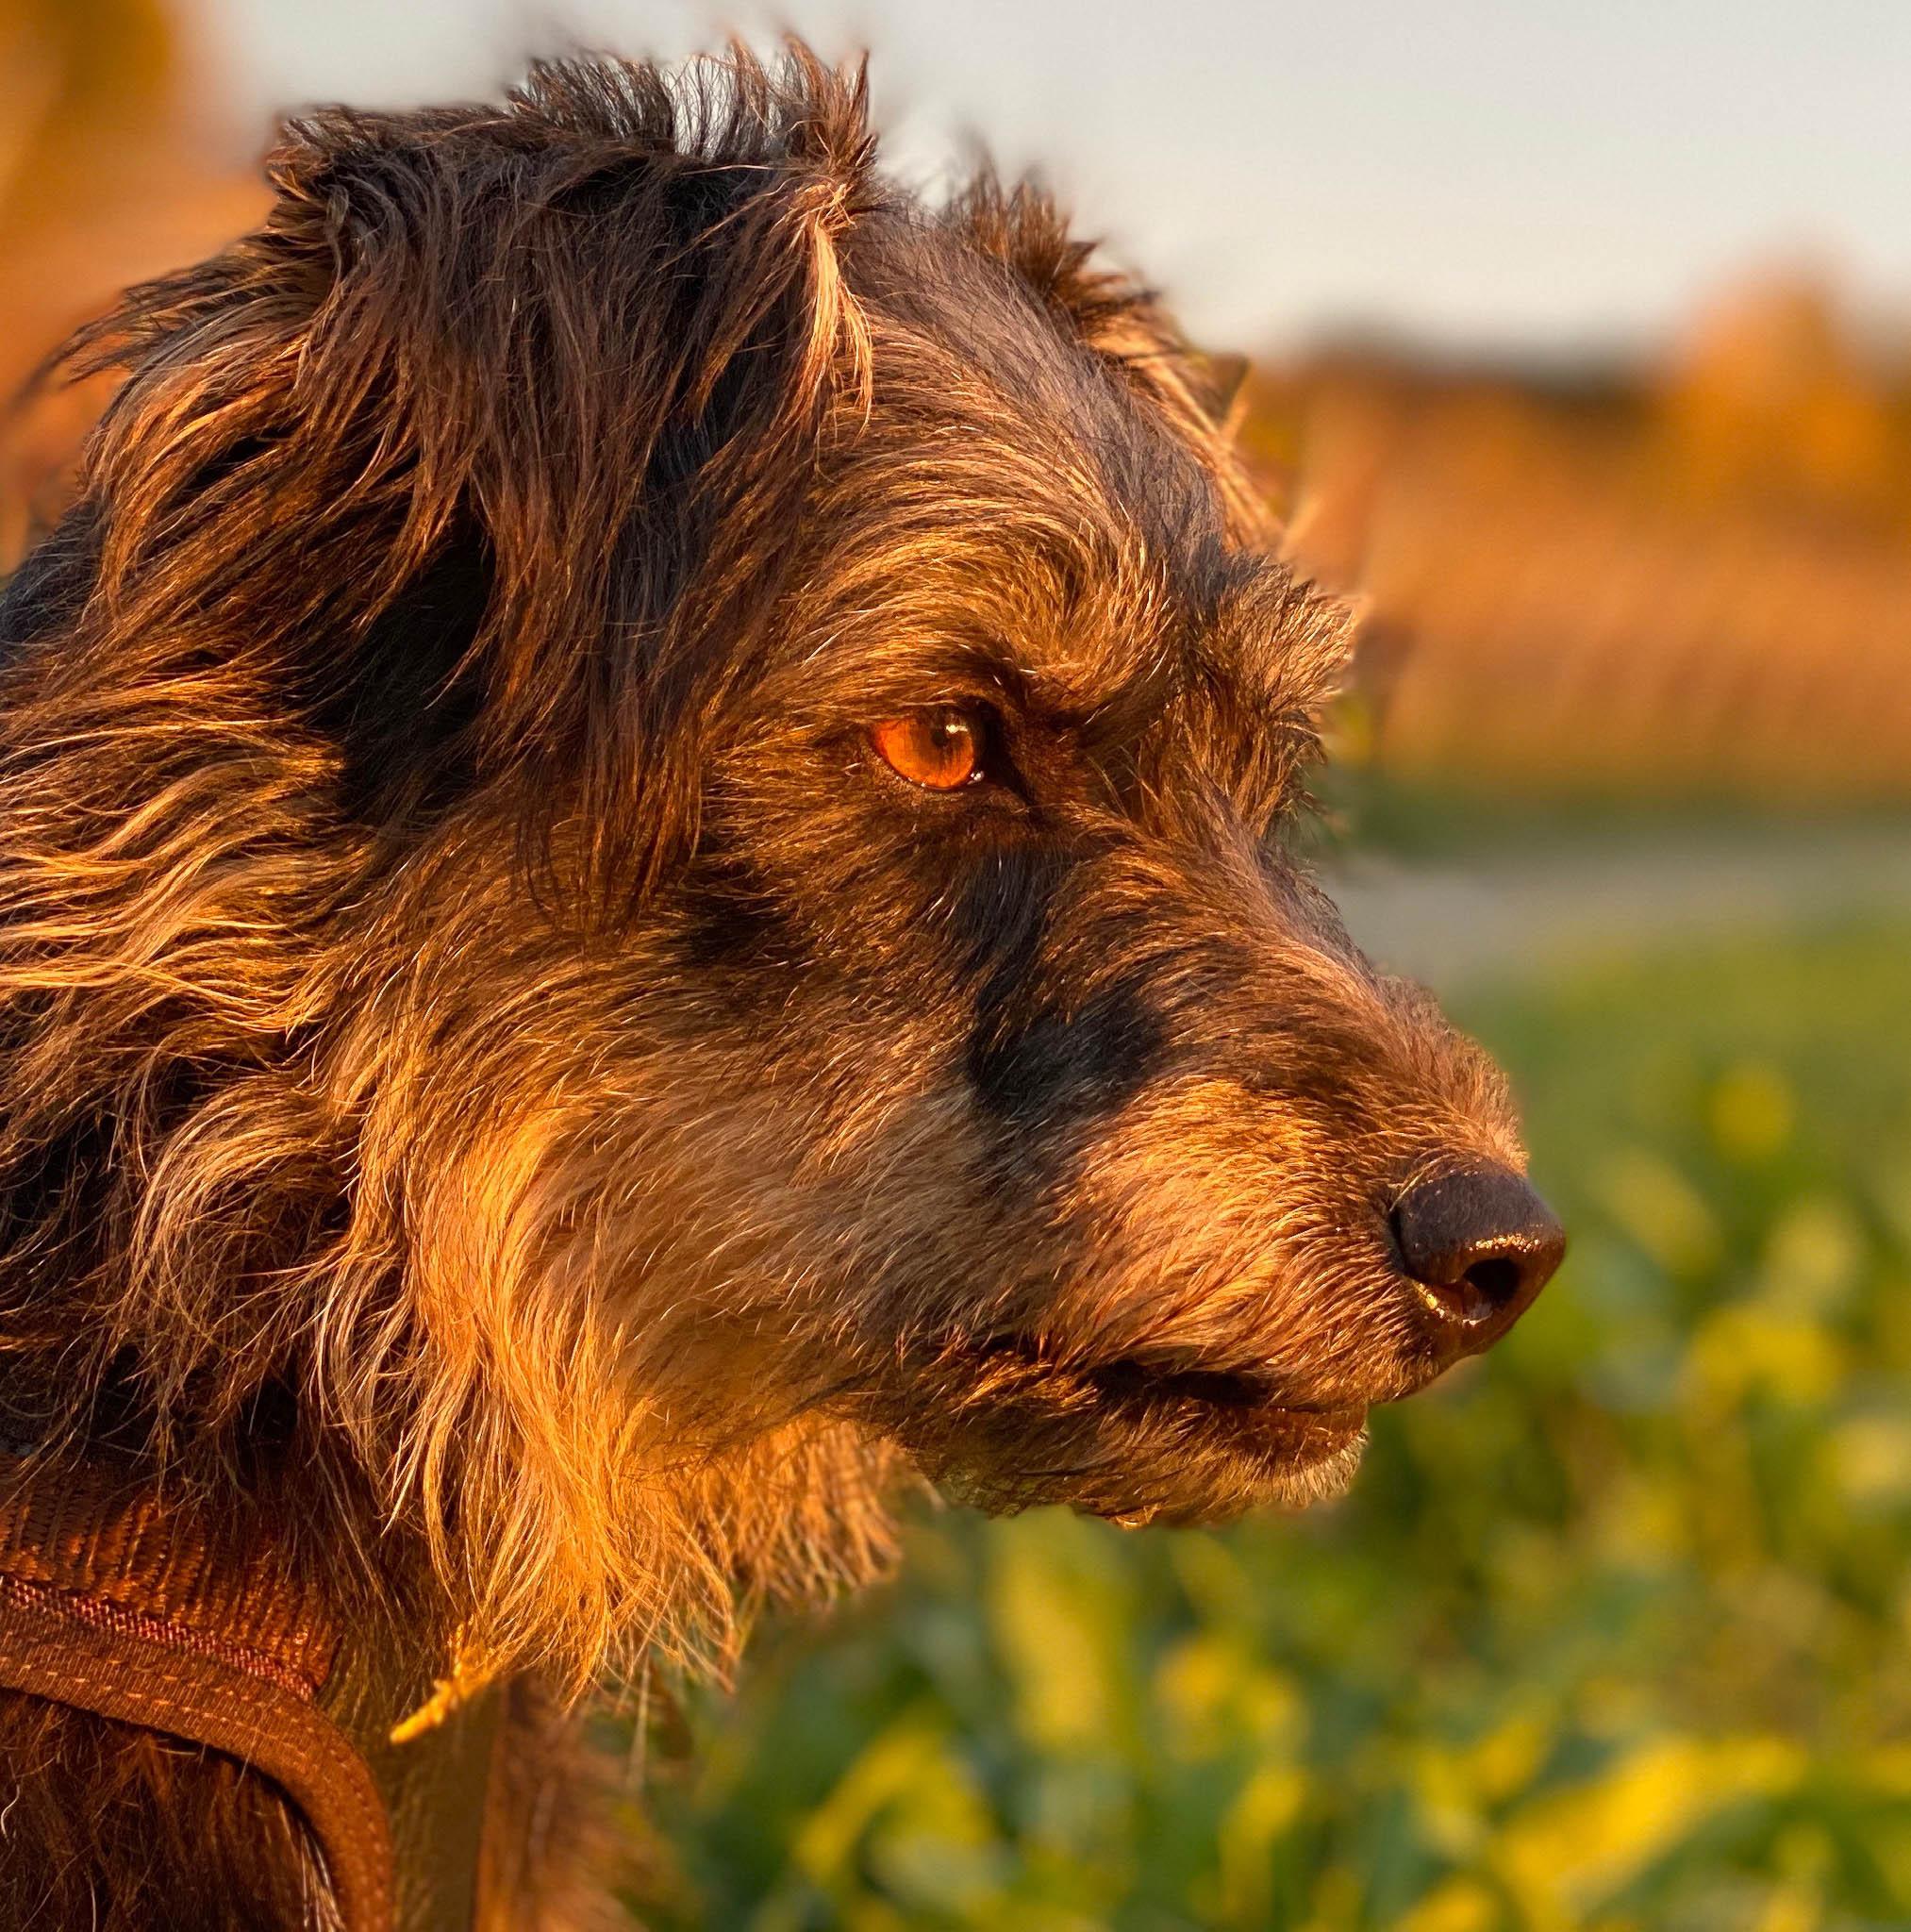 Hund im Profil - Körpersprache Hund